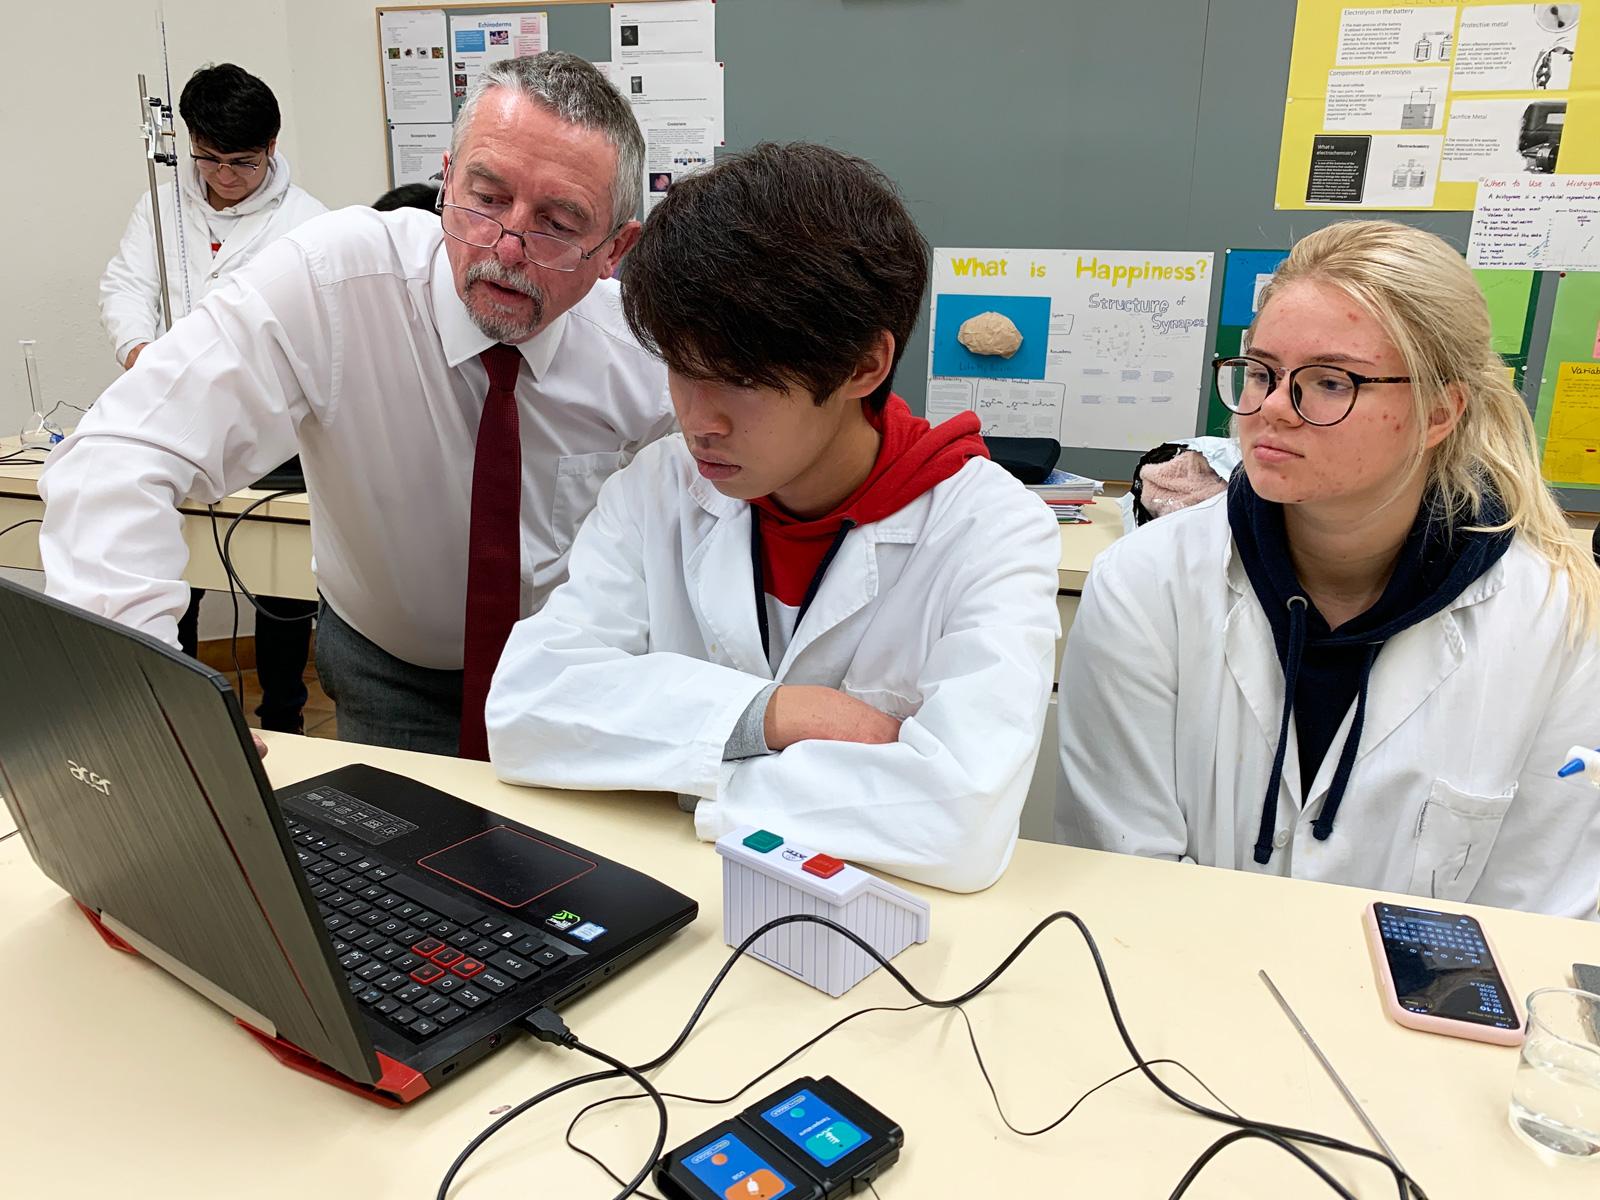 Chemistry-IGCSE-and-A-Levels-Programme-at-Brillantmont-International-School